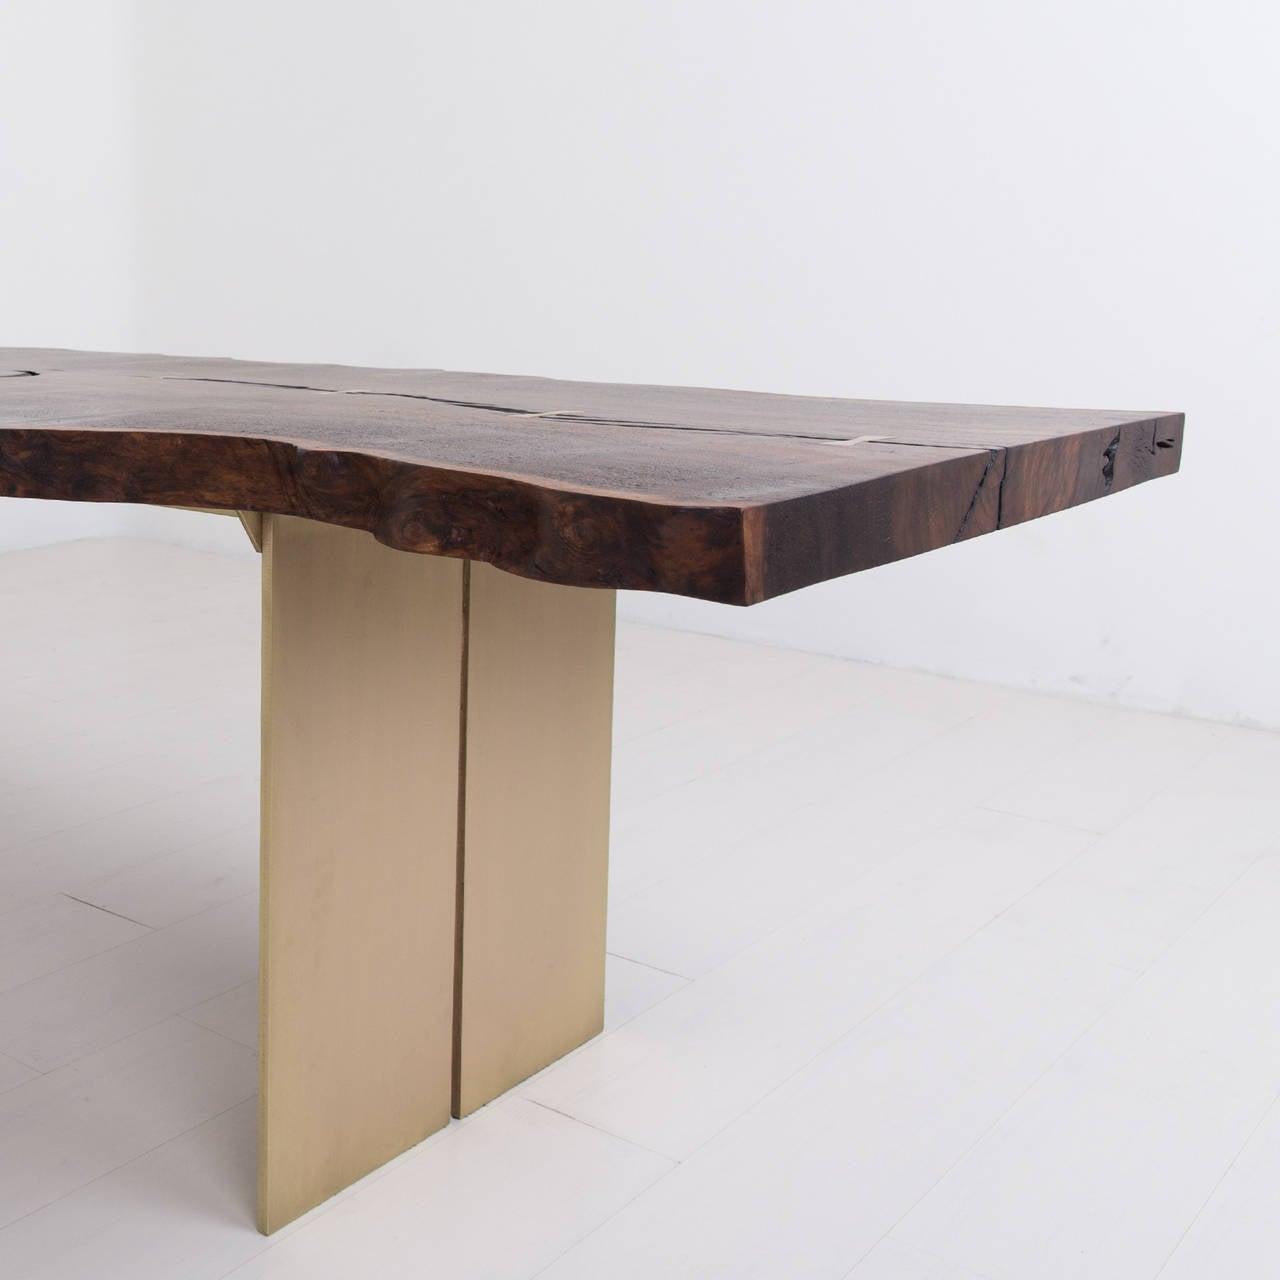 Milo Base Dining Table by Uhuru Design, Claro Walnut, Brass 6